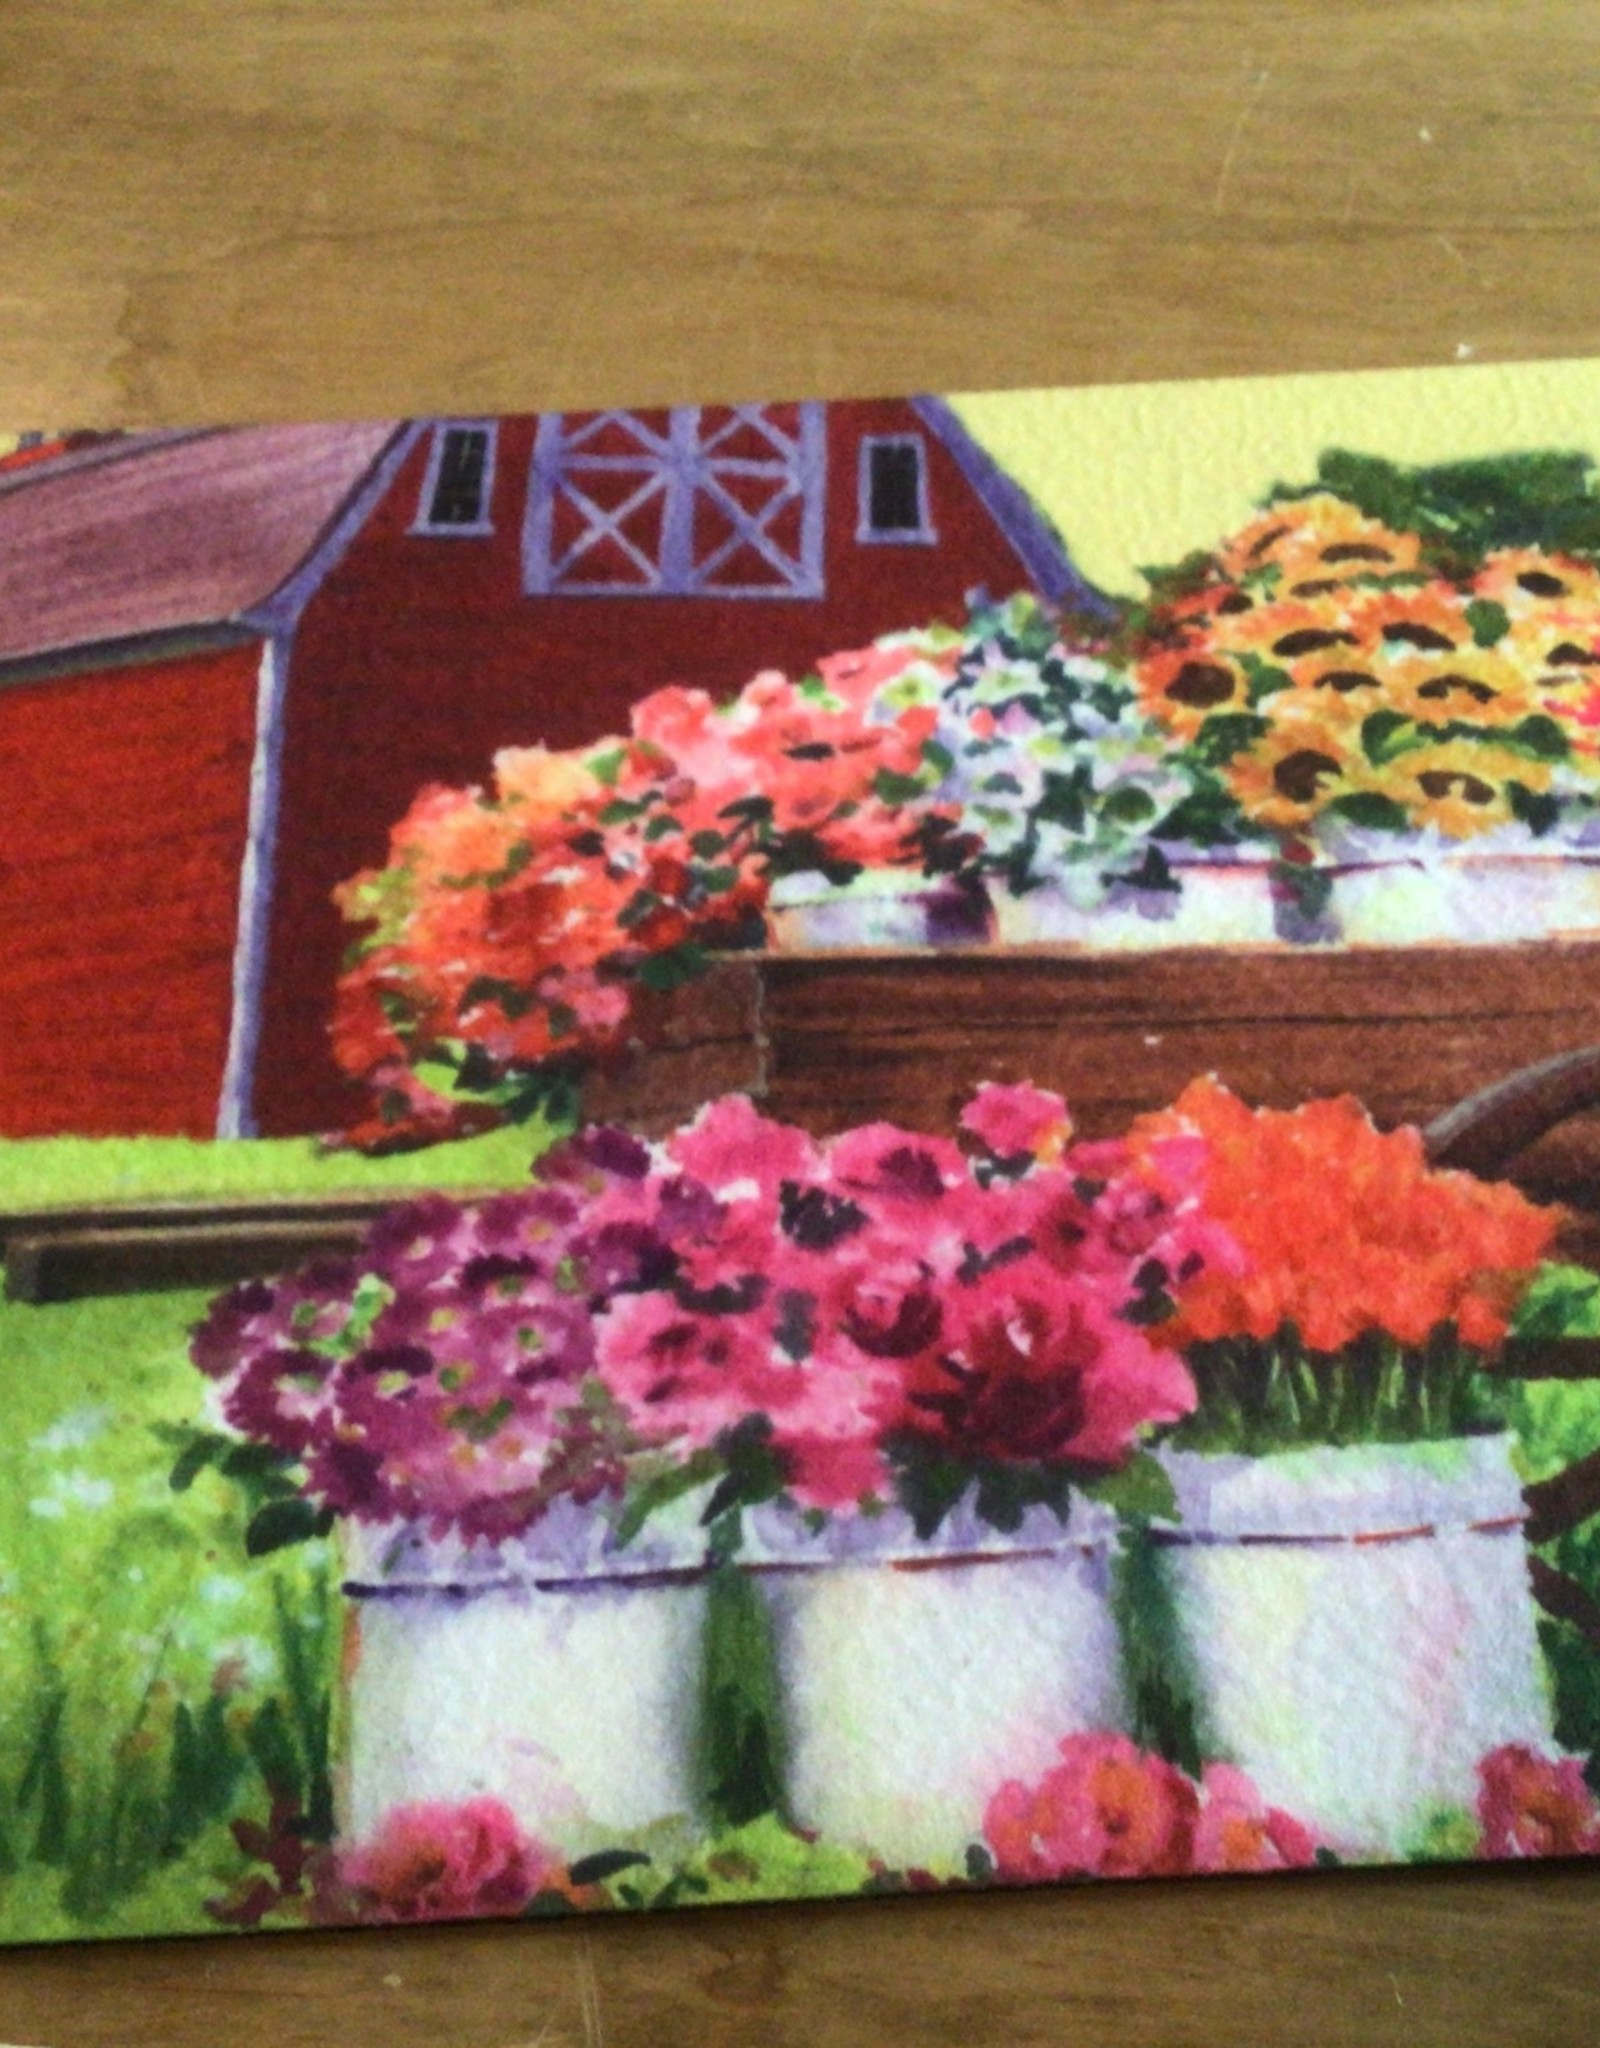 Flower Farm Sassafras's Switch Mat